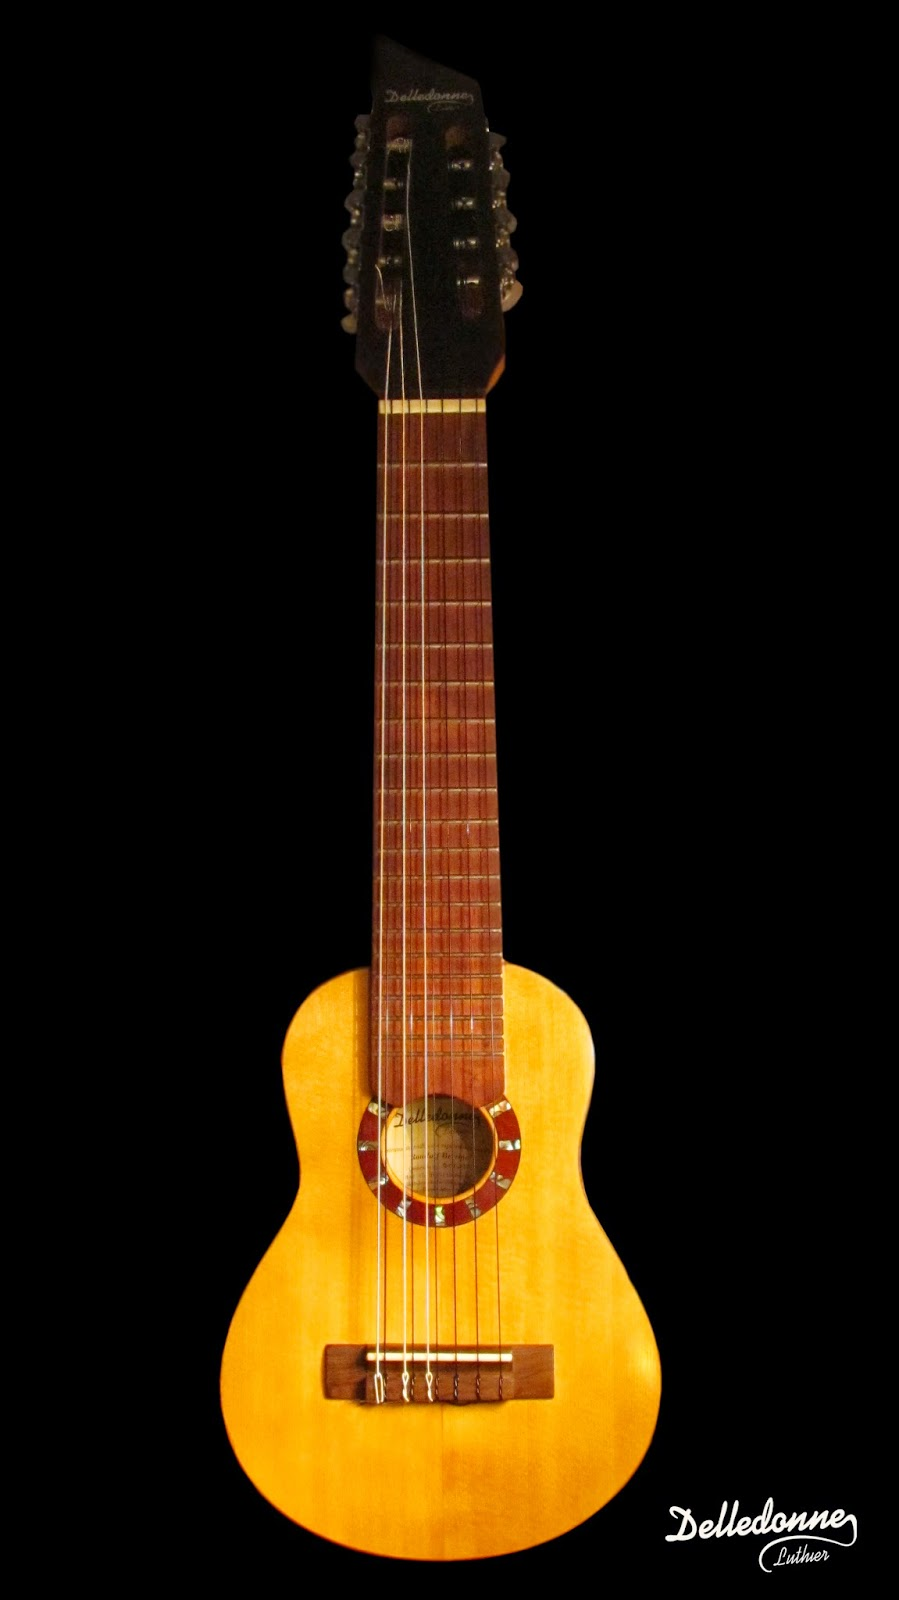 Mariano delledonne luthier el seis for Que es un luthier